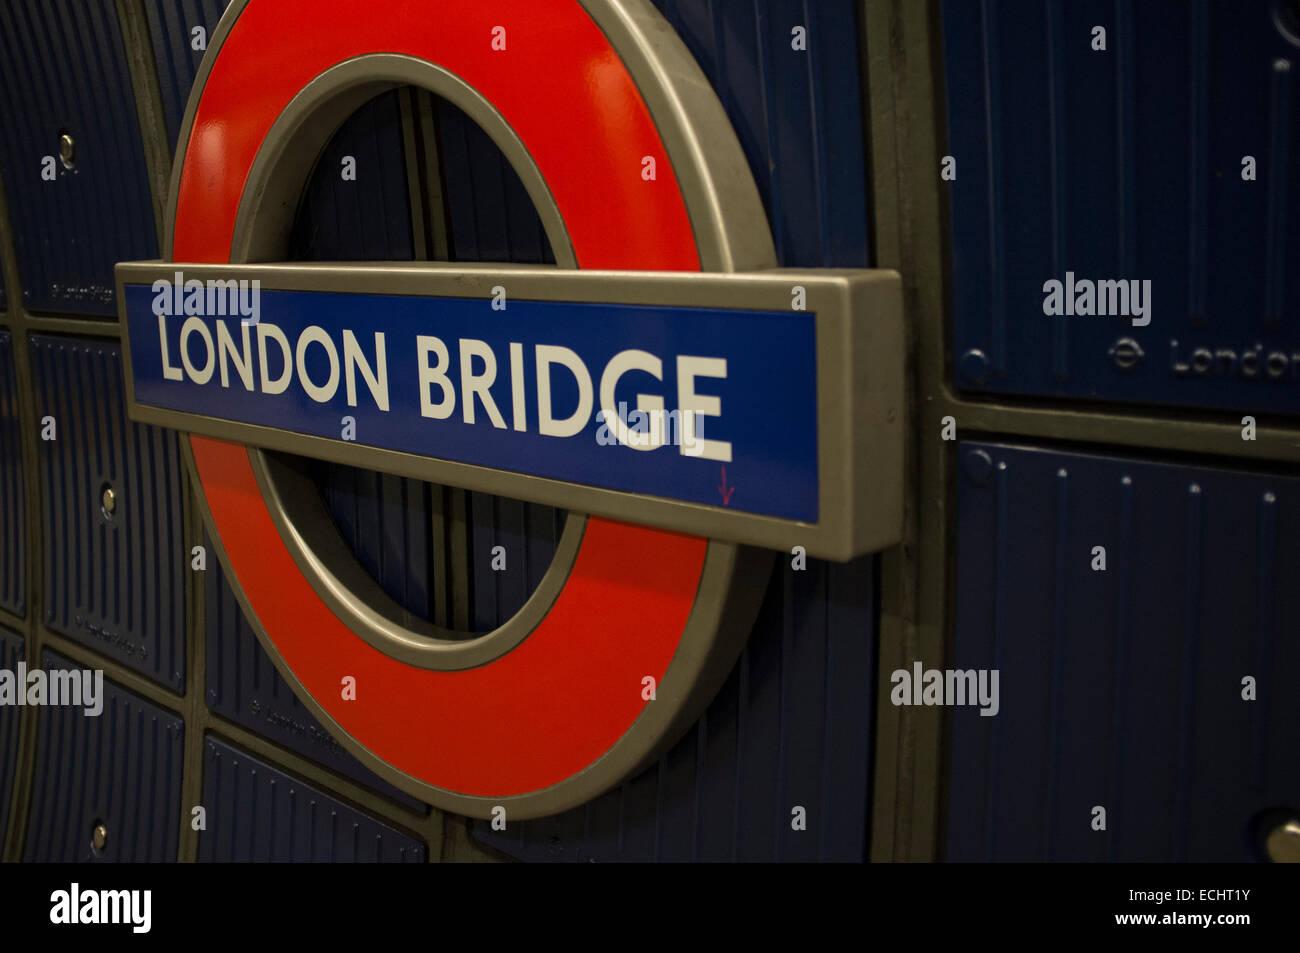 London Bridge Tube Station Sign Stock Photo 76609399 Alamy